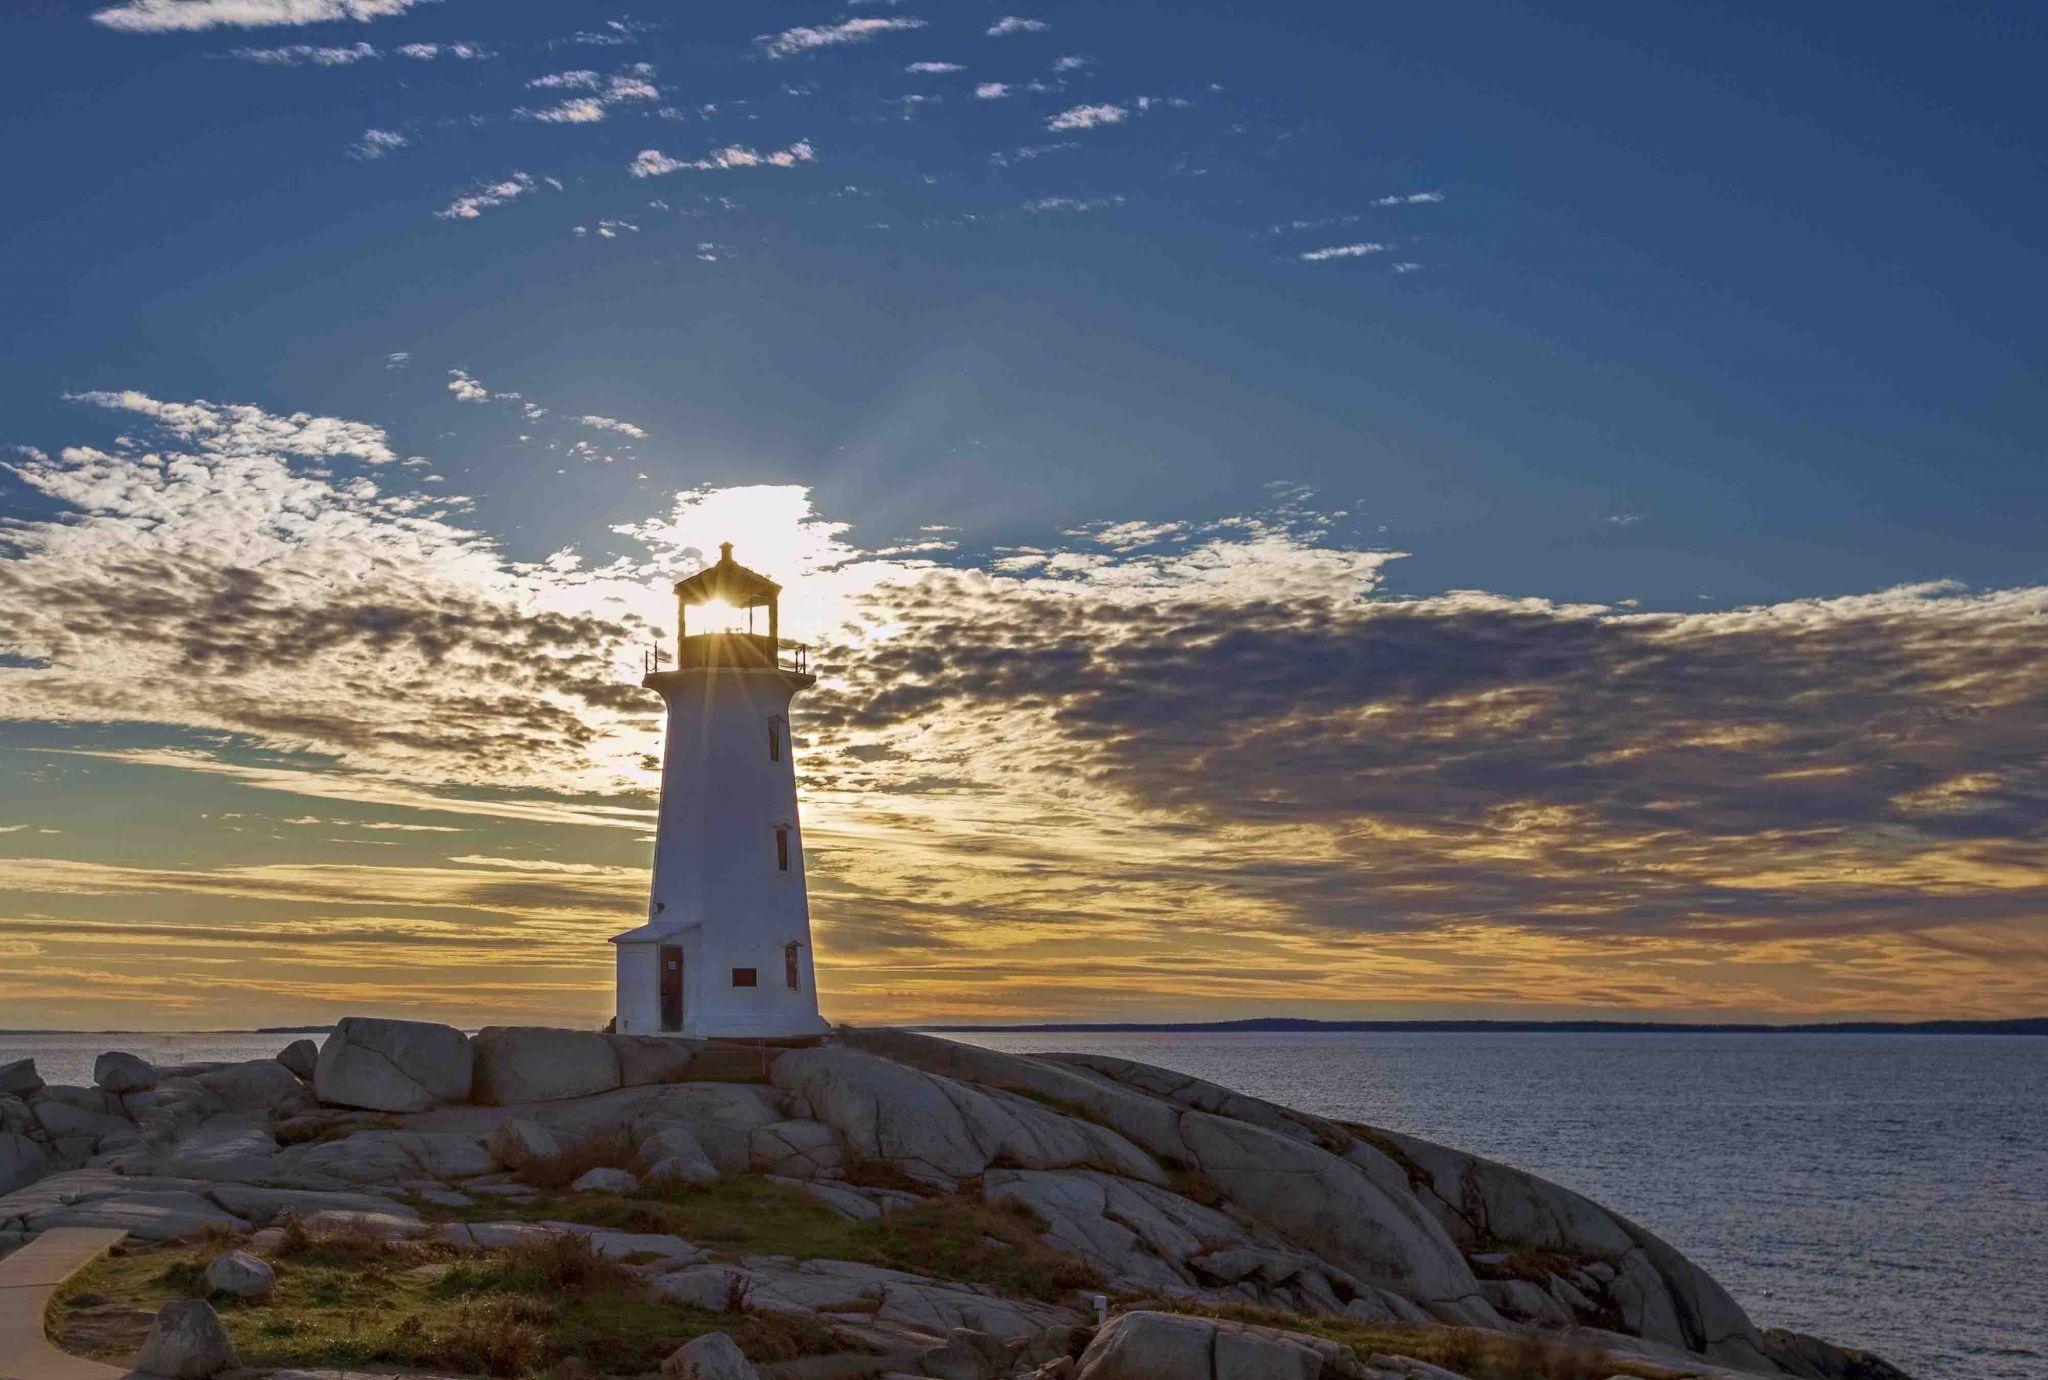 Peggy's Cove Lighthouse in Nova Scotia, Canada